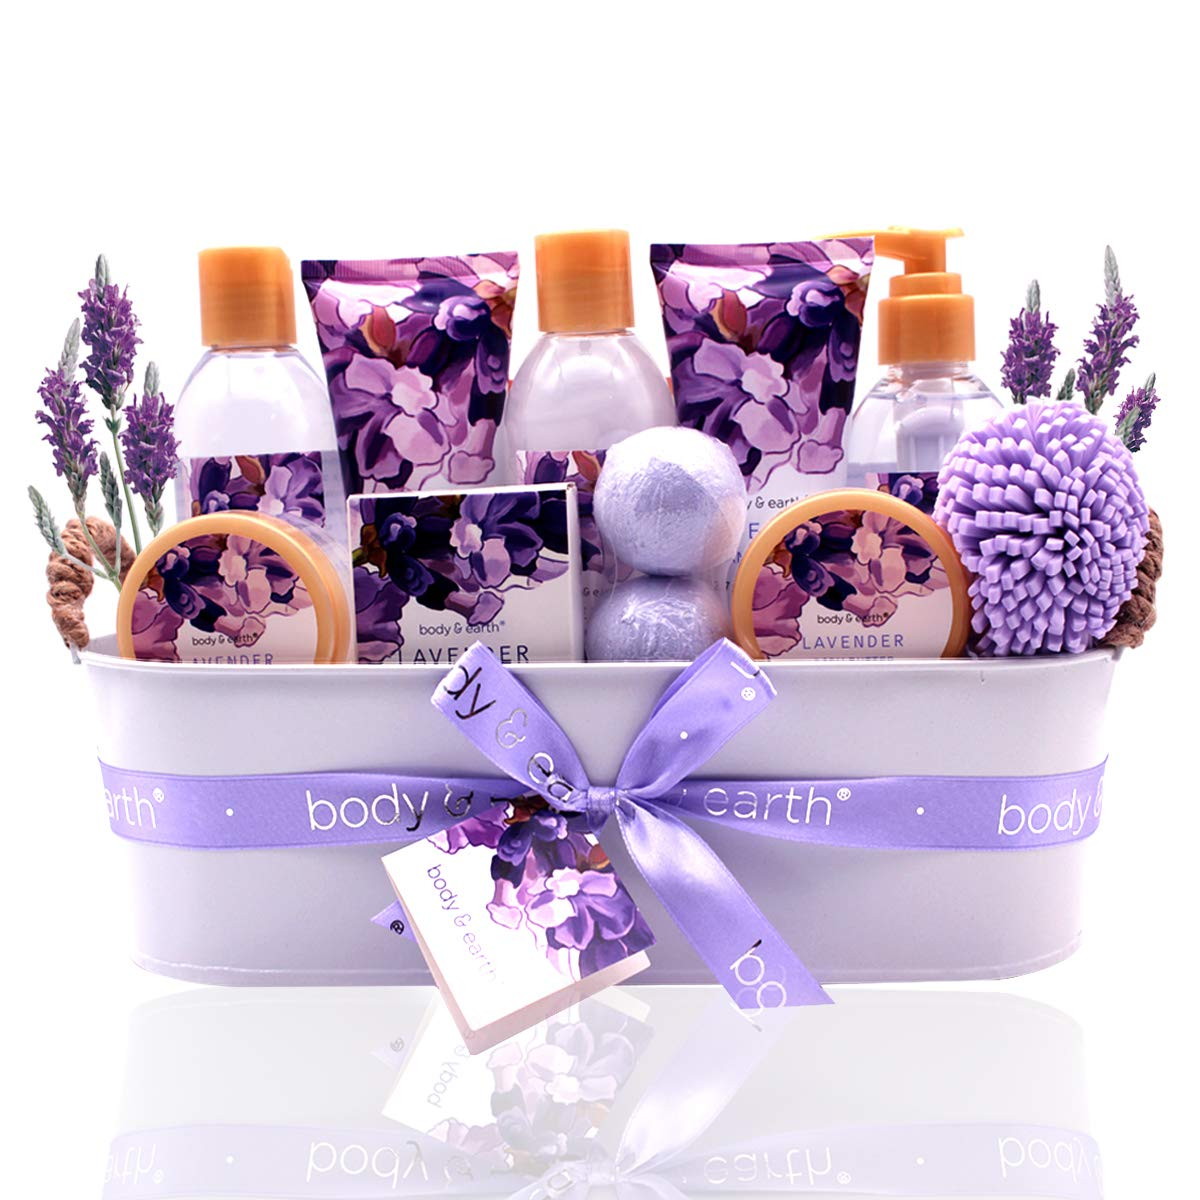 Bath Spa Gift Basket, Body & Earth Bath Gift Set 12 Pcs Lavender Scented, Includes Shower Gel, Bubble Bath, Bath Salt, Bath Bomb, Body Lotion and More, Bath and Body Gift Idea for Birthday Christmas